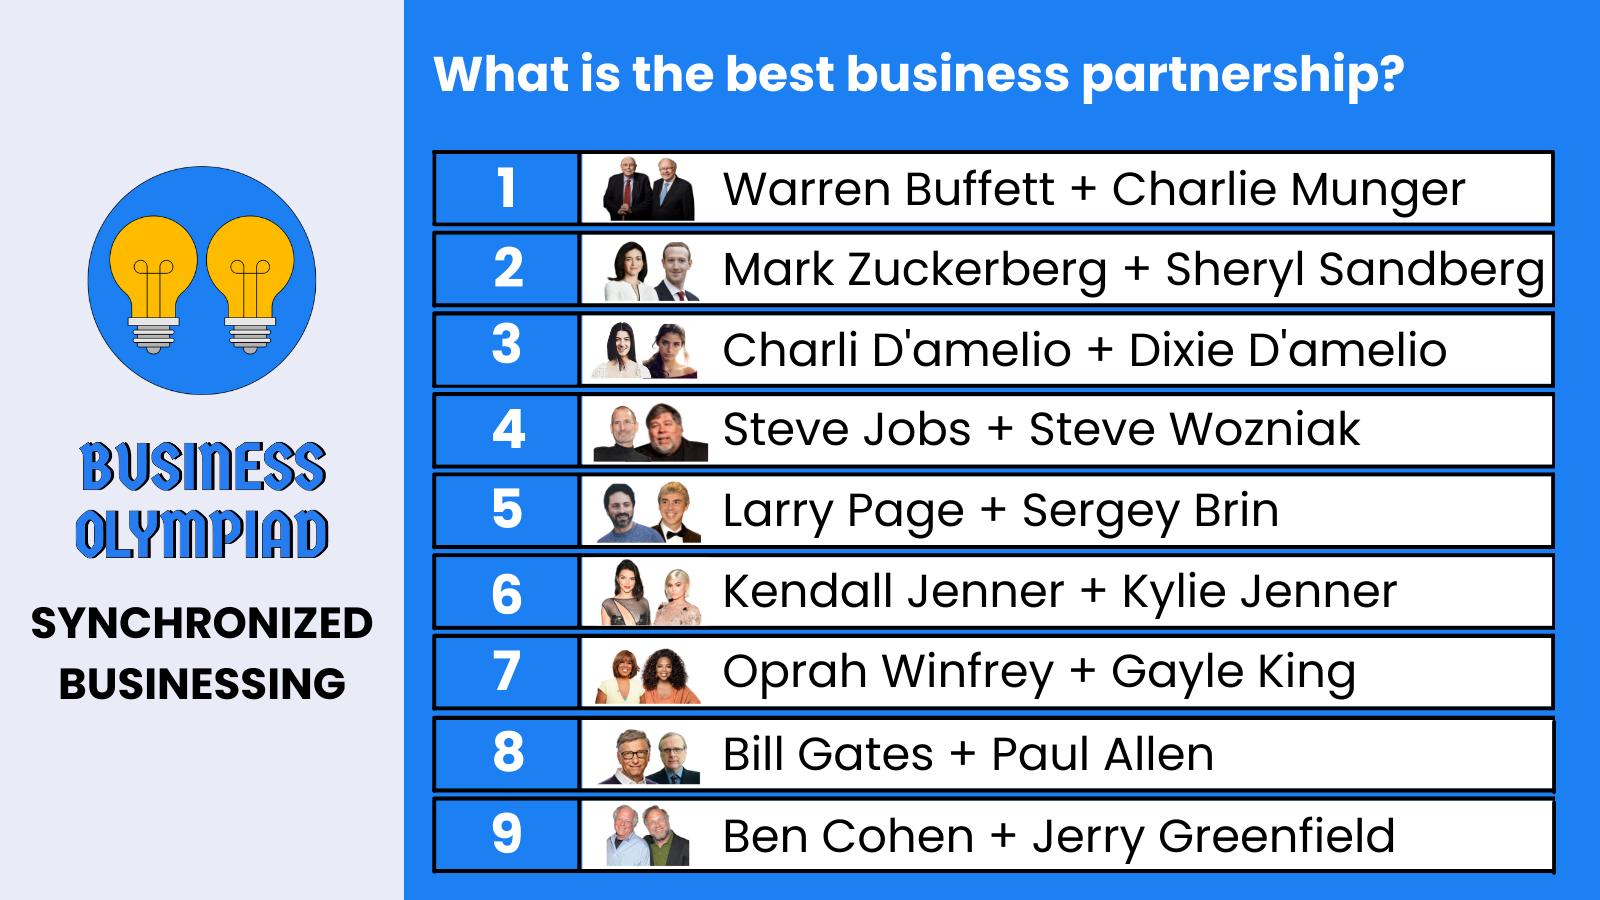 Synchronized Businessing leaderboard